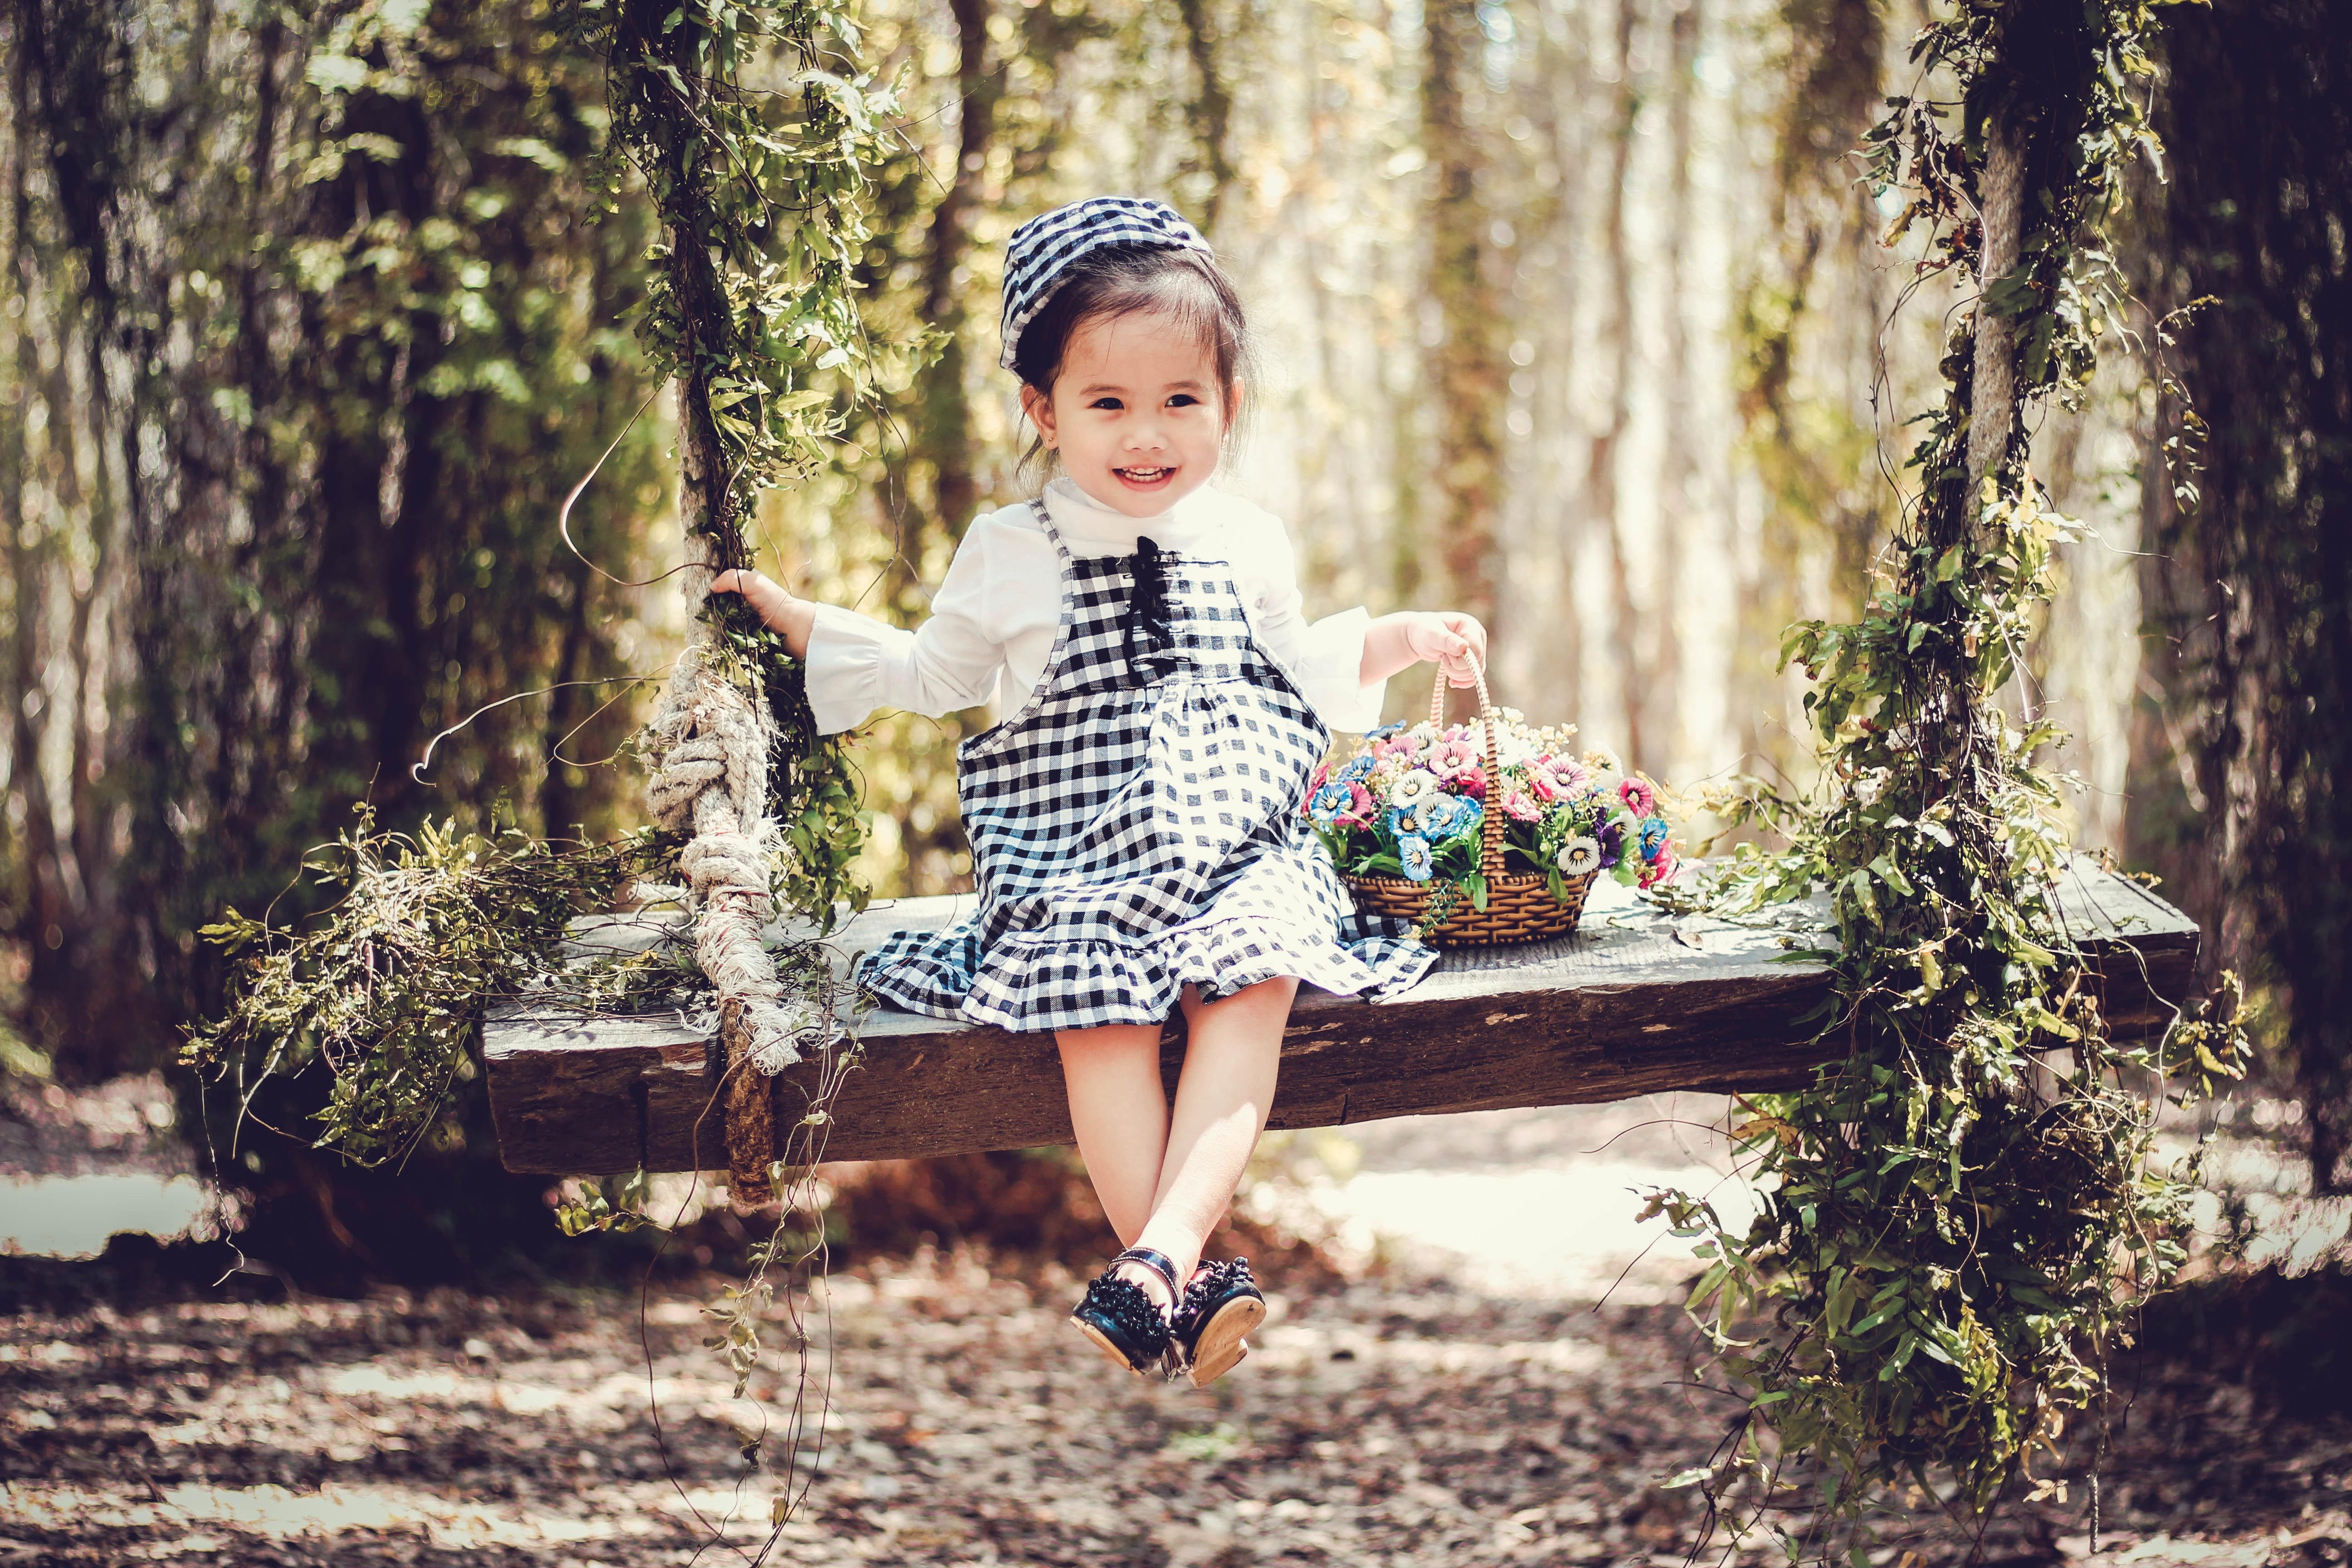 baby-basket-beautiful-933186.jpg